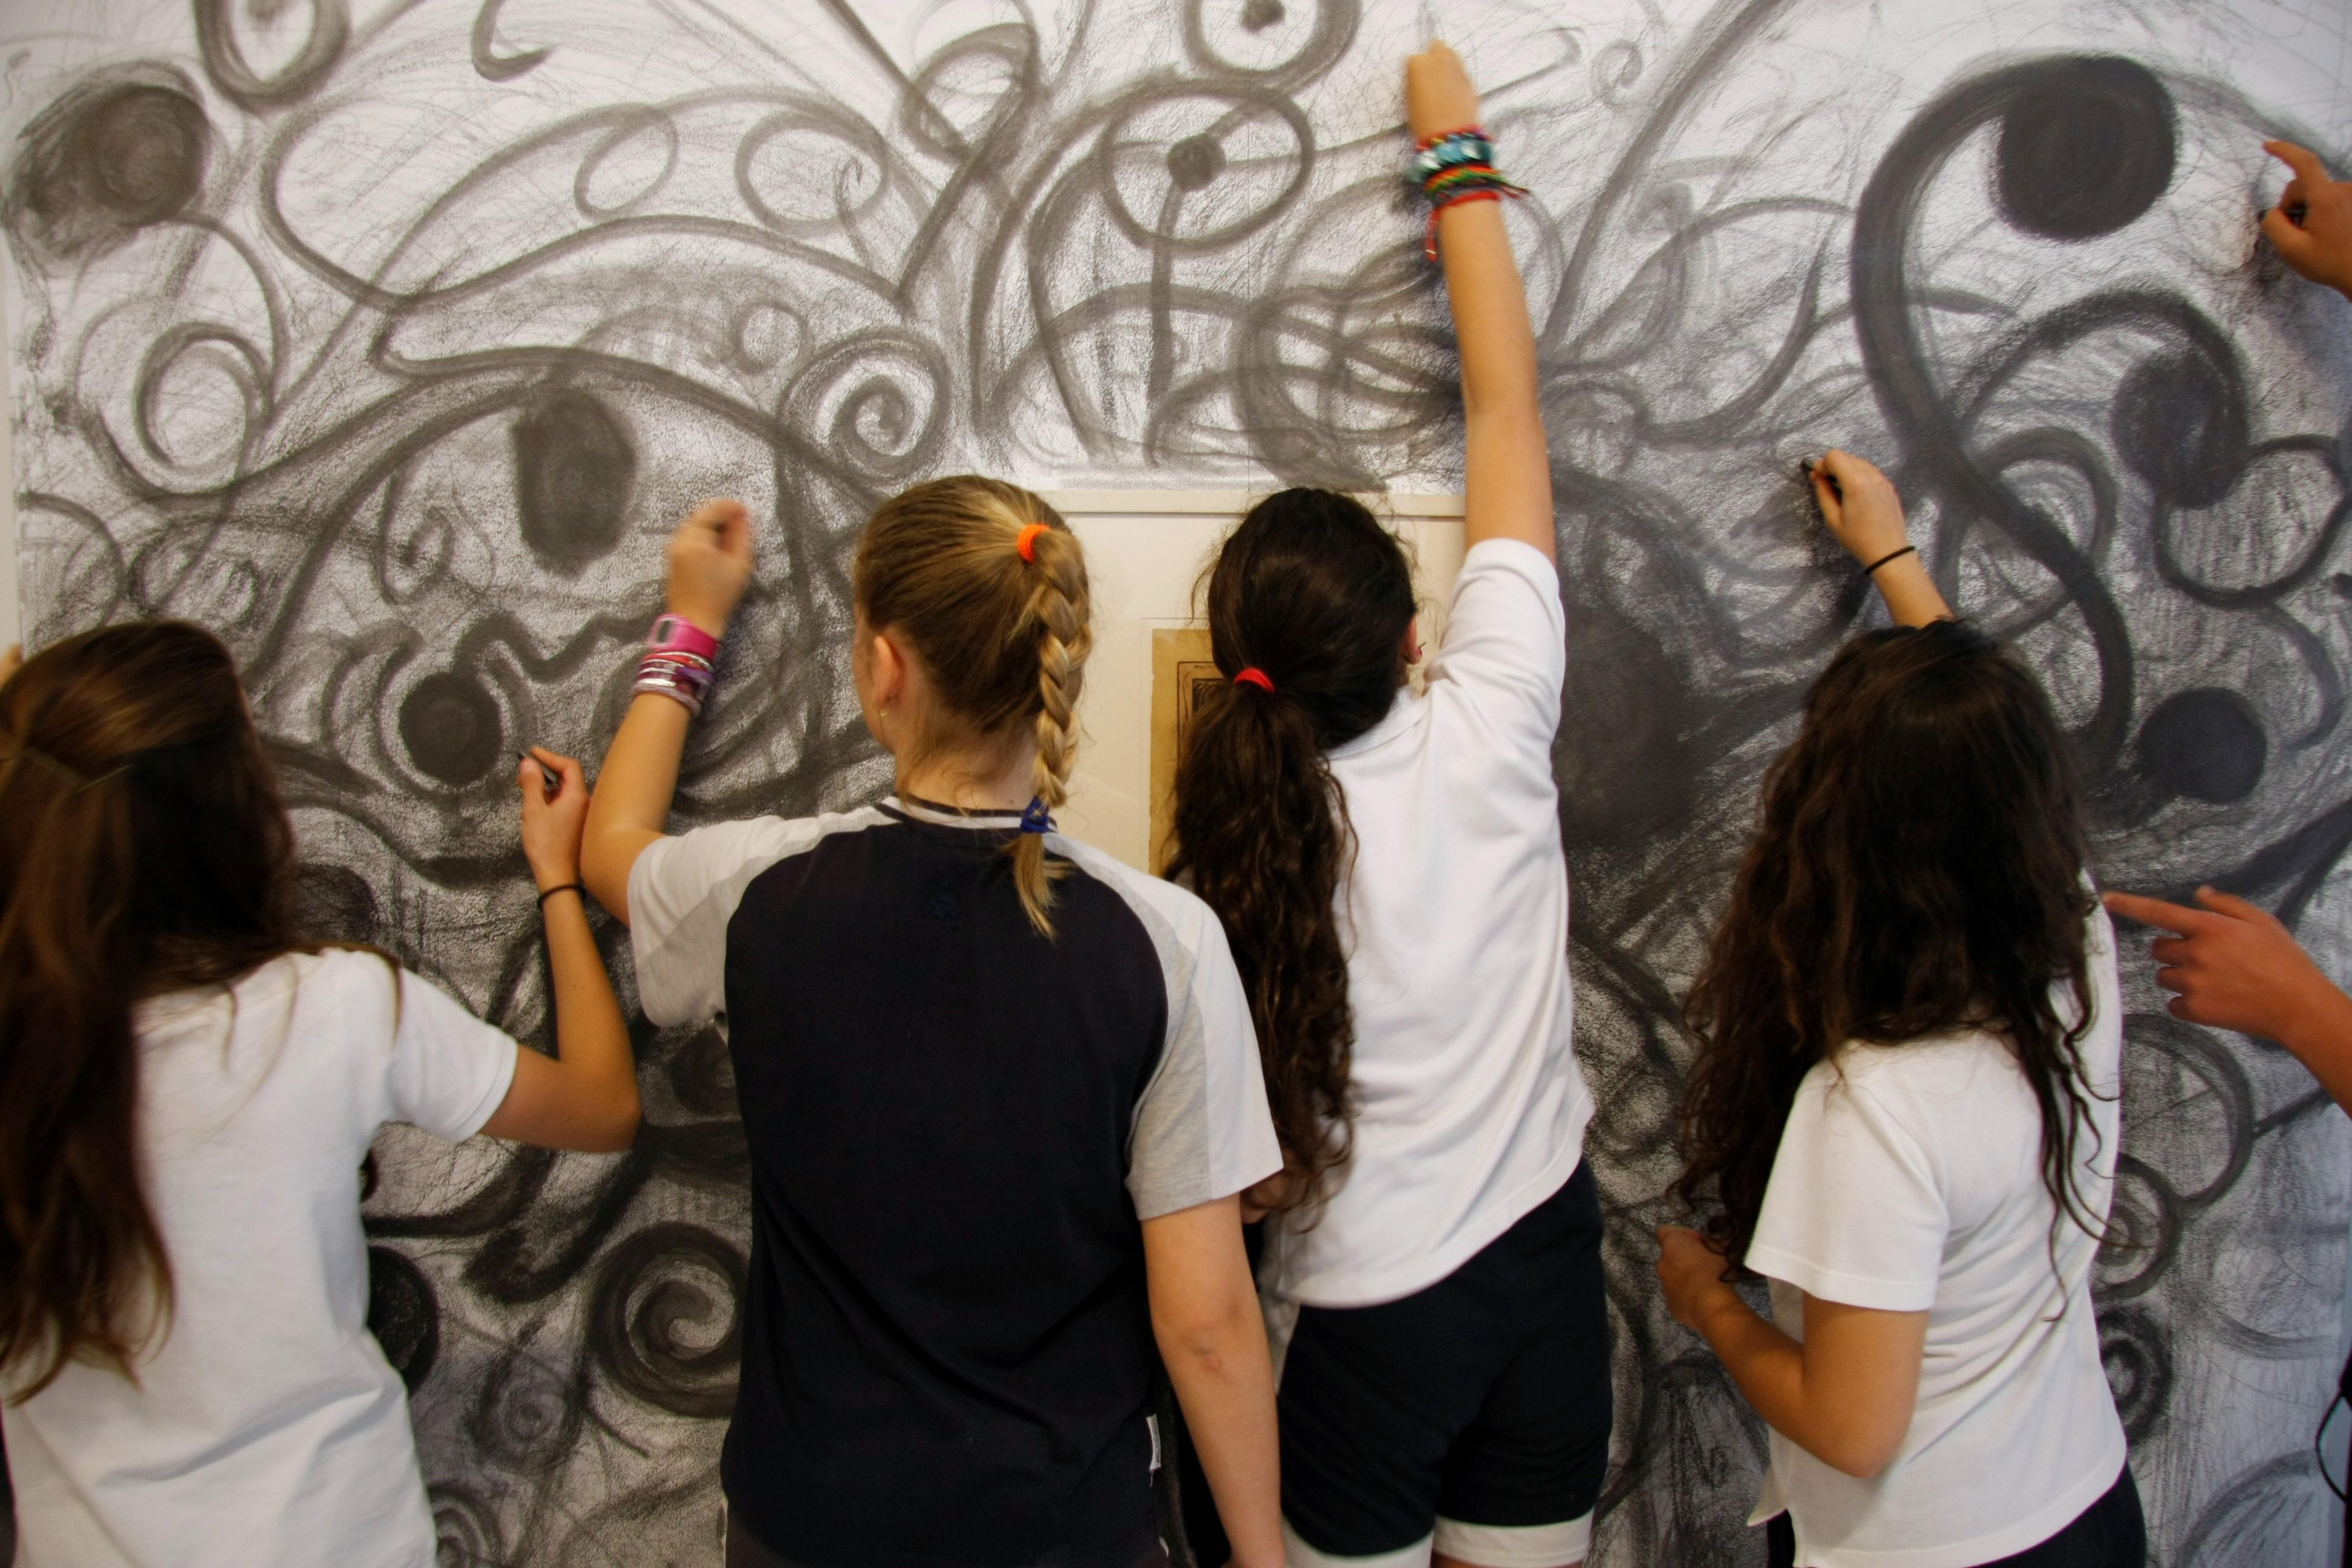 Marín Ricardo. 2013. Munch 5.